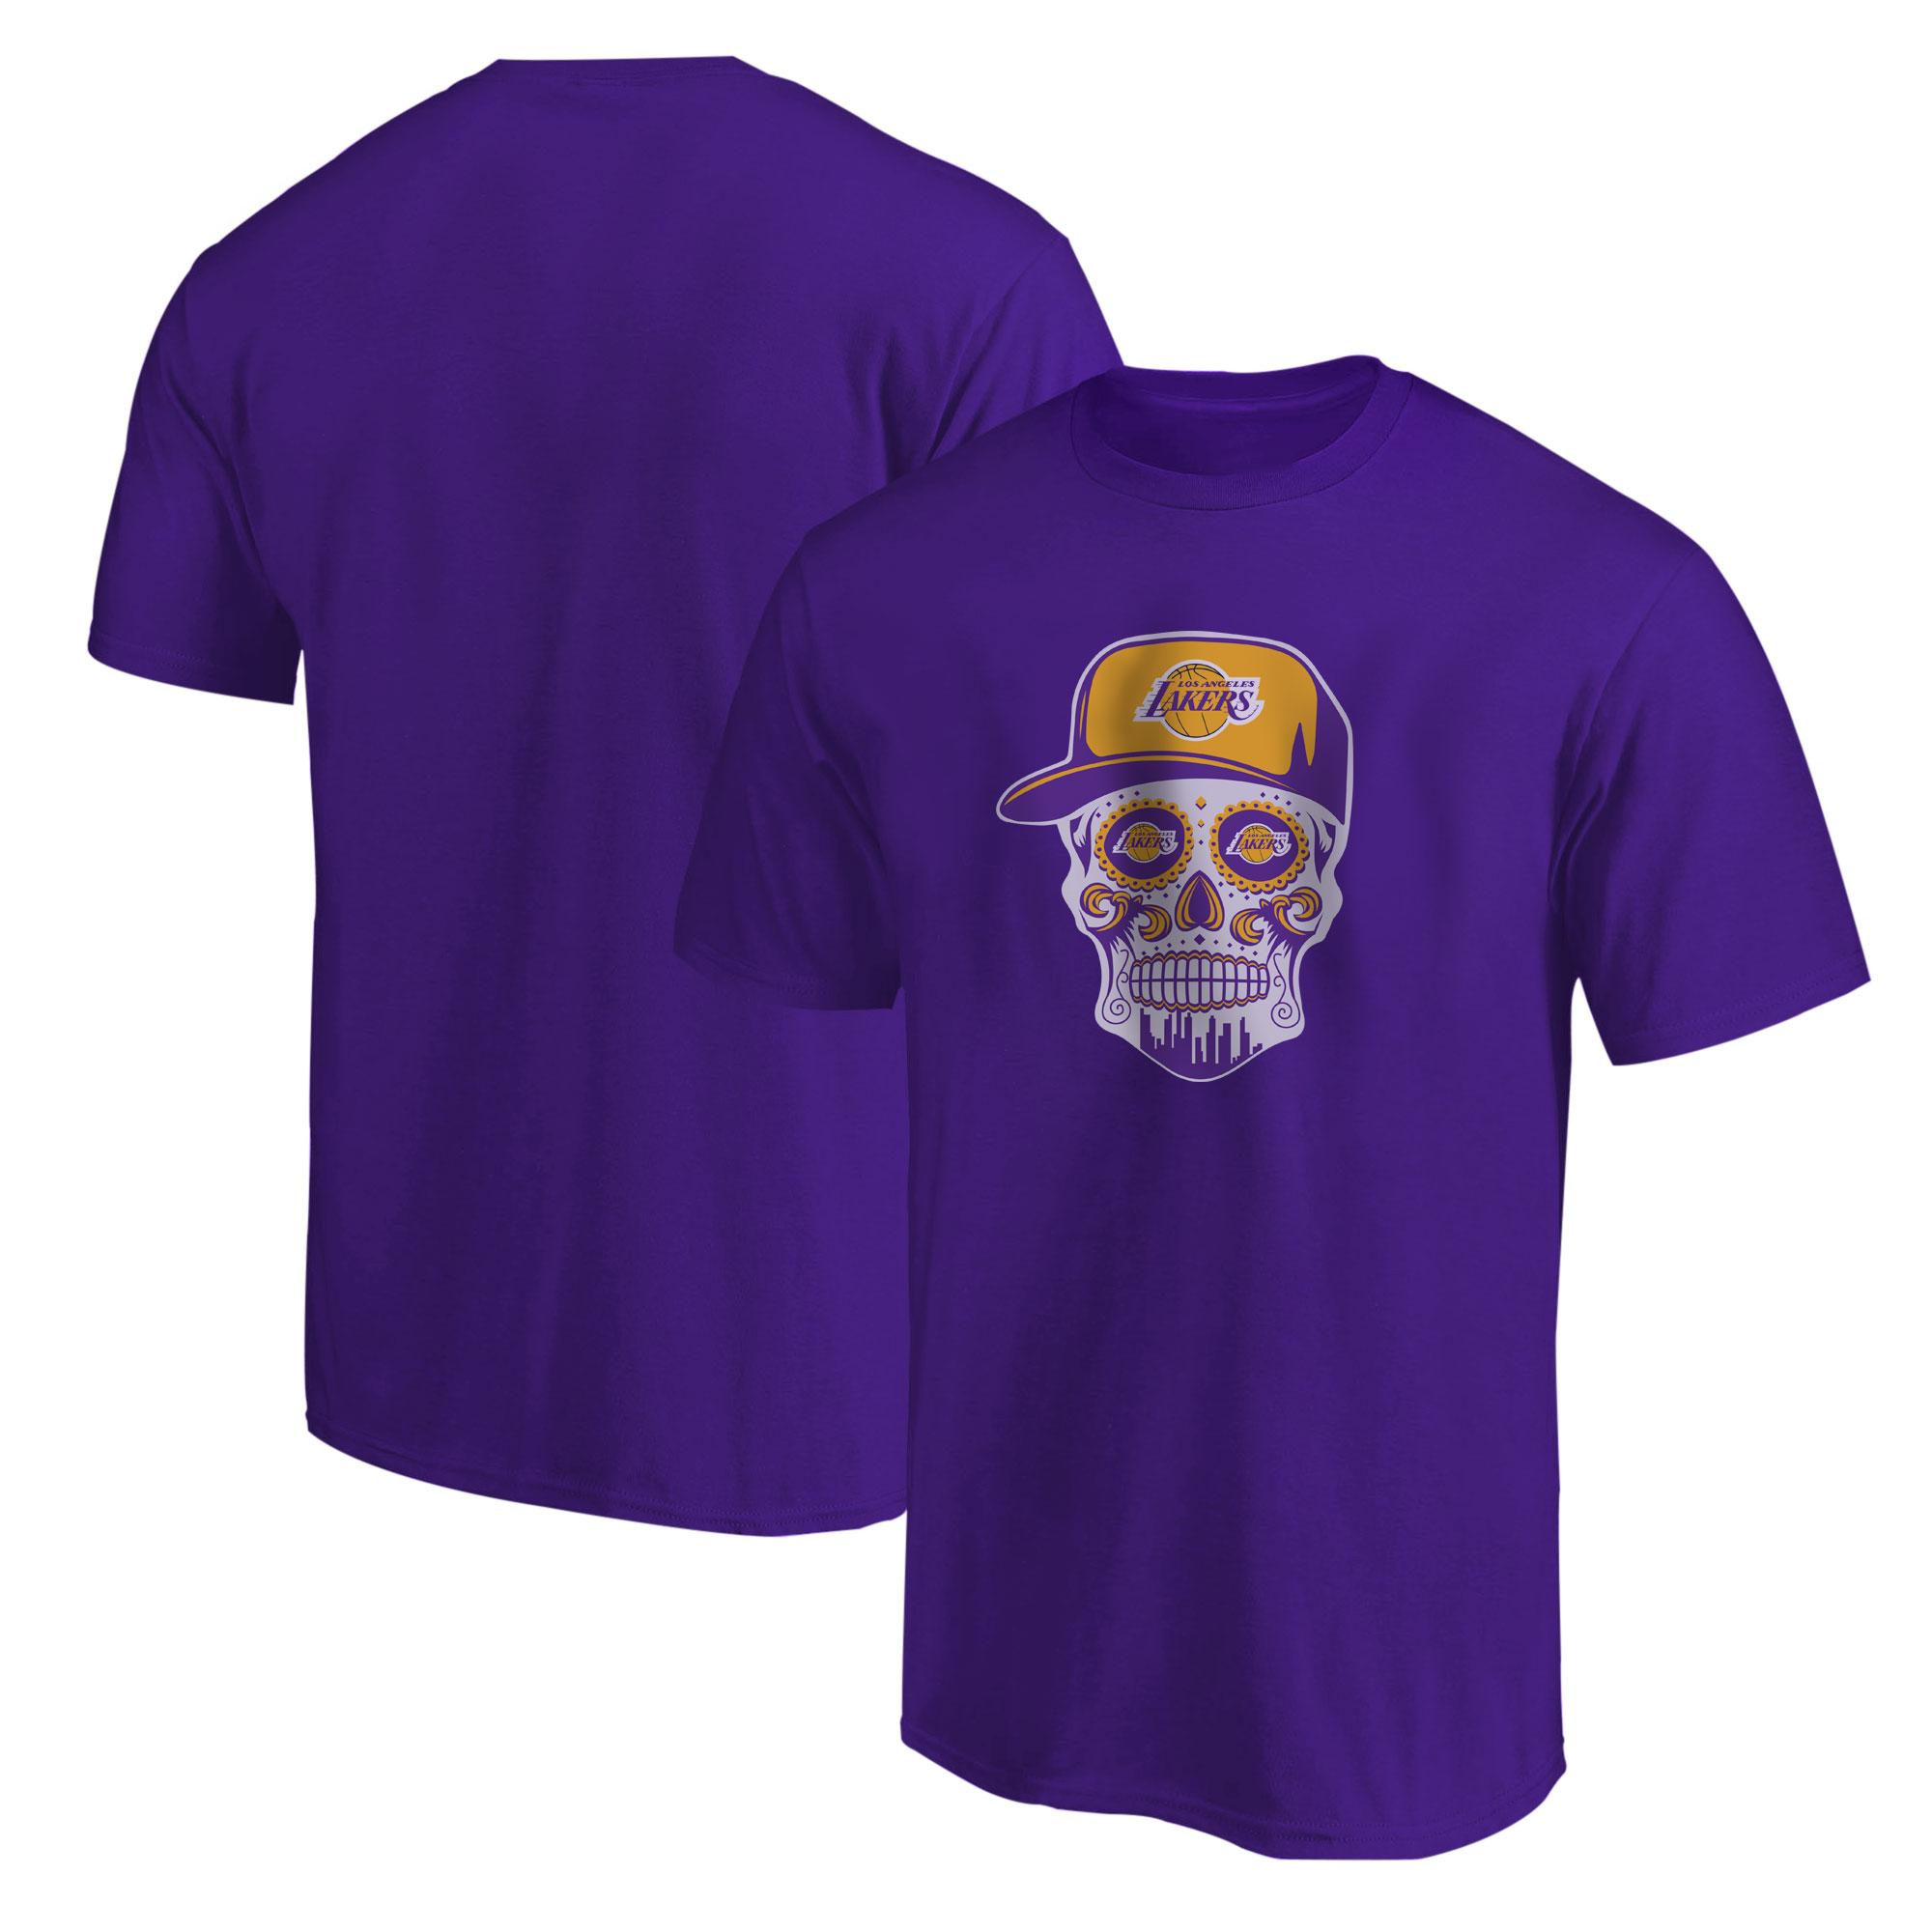 Lakers Skull Tshirt (TSH-PRP-NP-454-NBA-LKRS-SKULL)